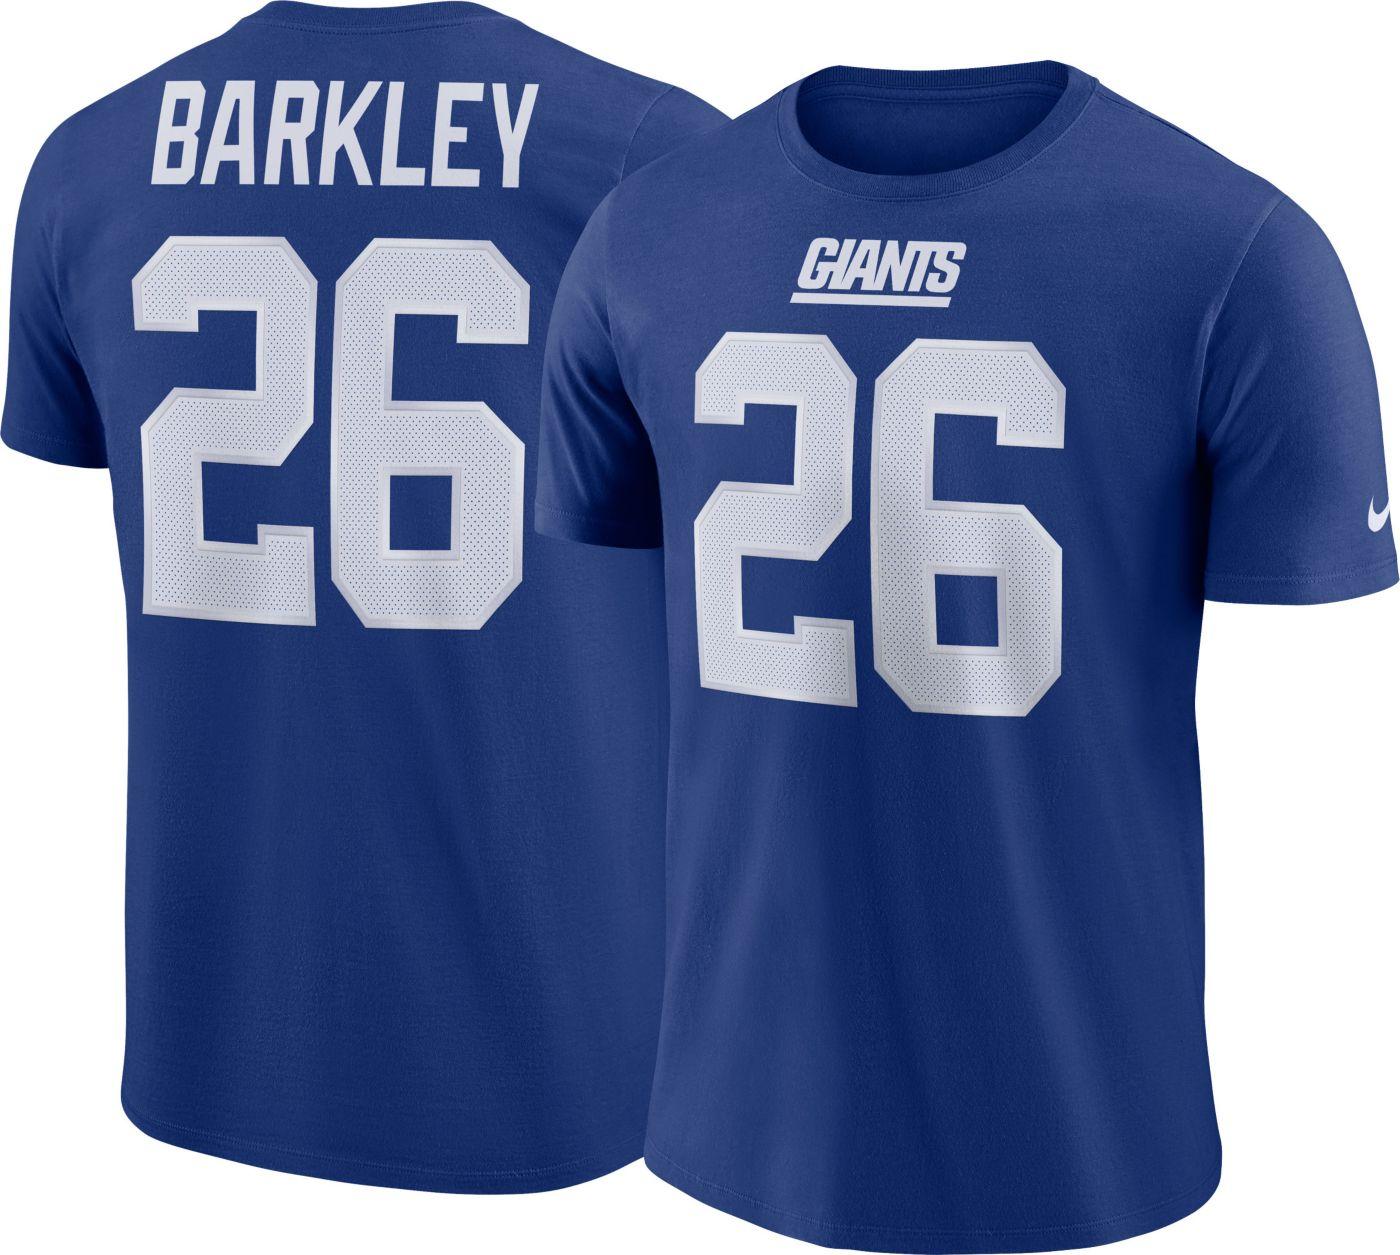 Saquon Barkley #26 Nike Men's New York Giants Pride Blue T-Shirt